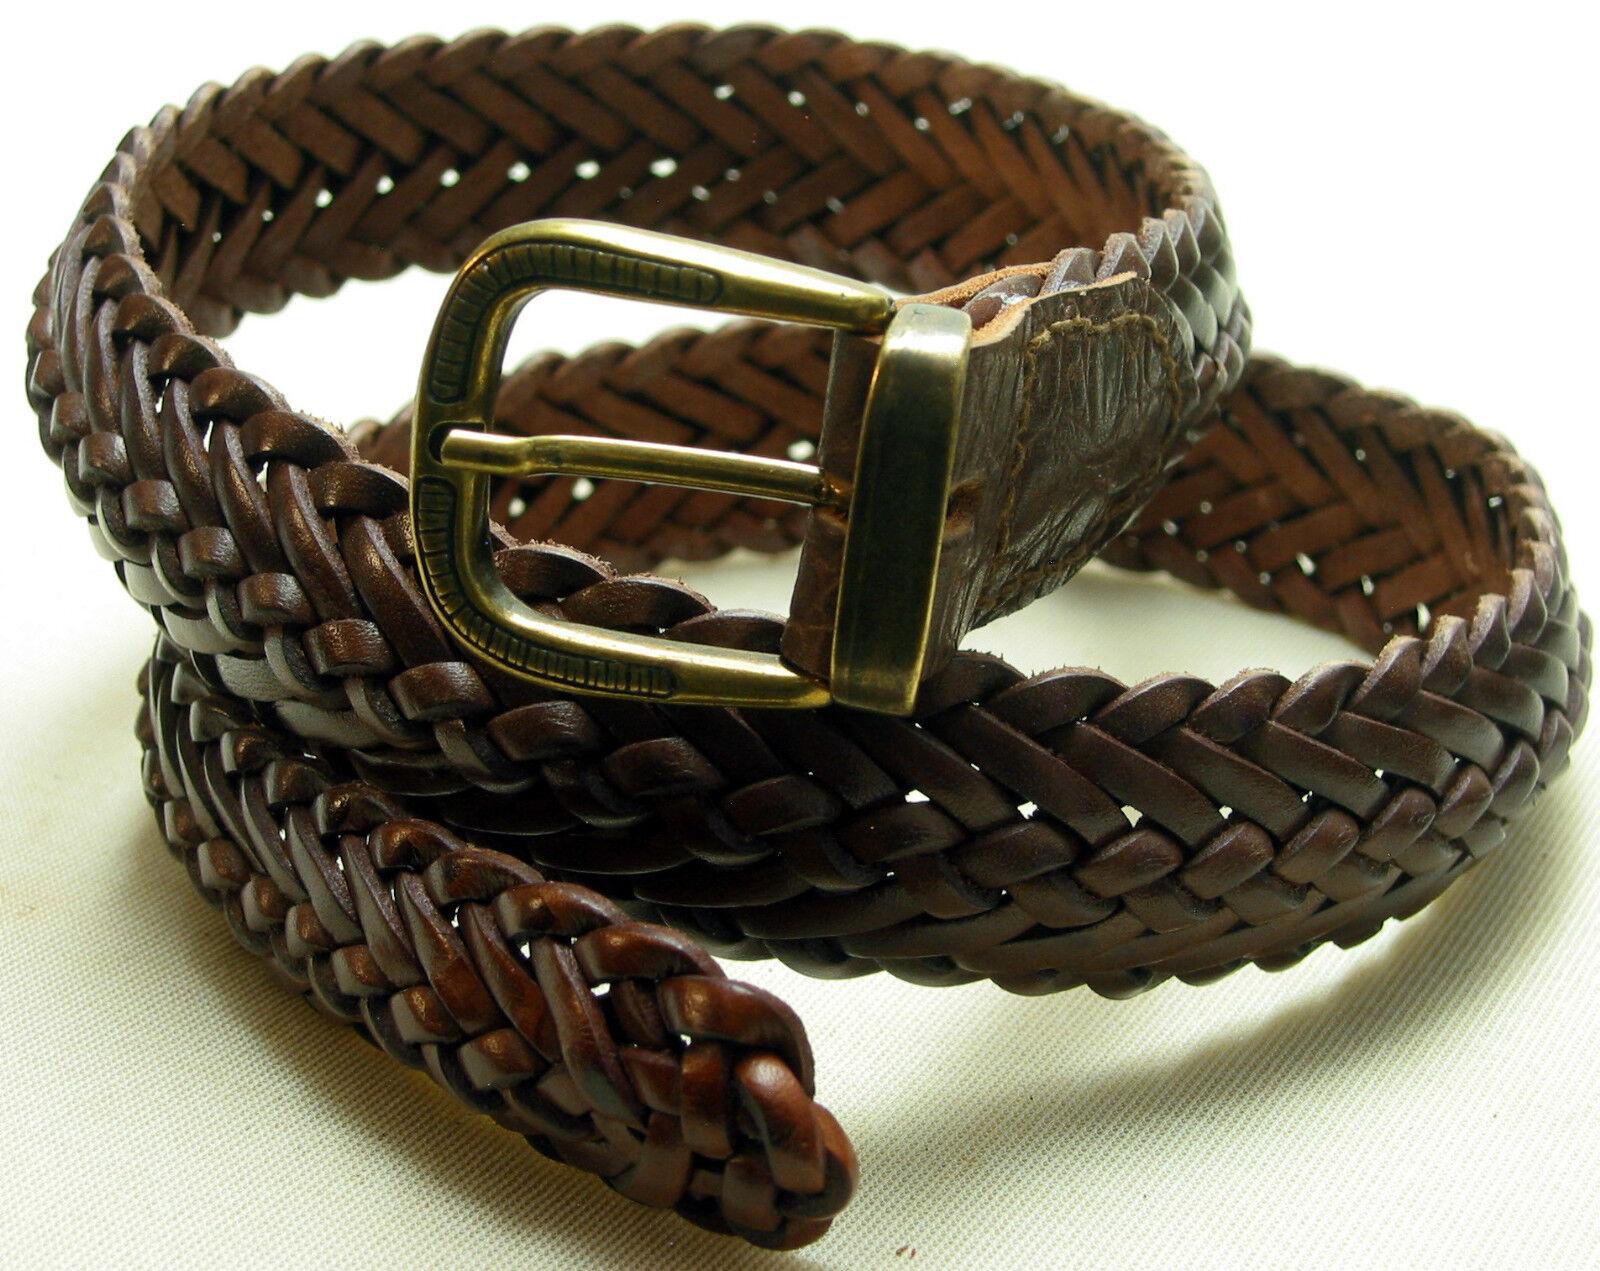 1A Saddler Quality Leather Belt NEW Flechtgürtel Leather flechtledergürtel 3cm 1A #